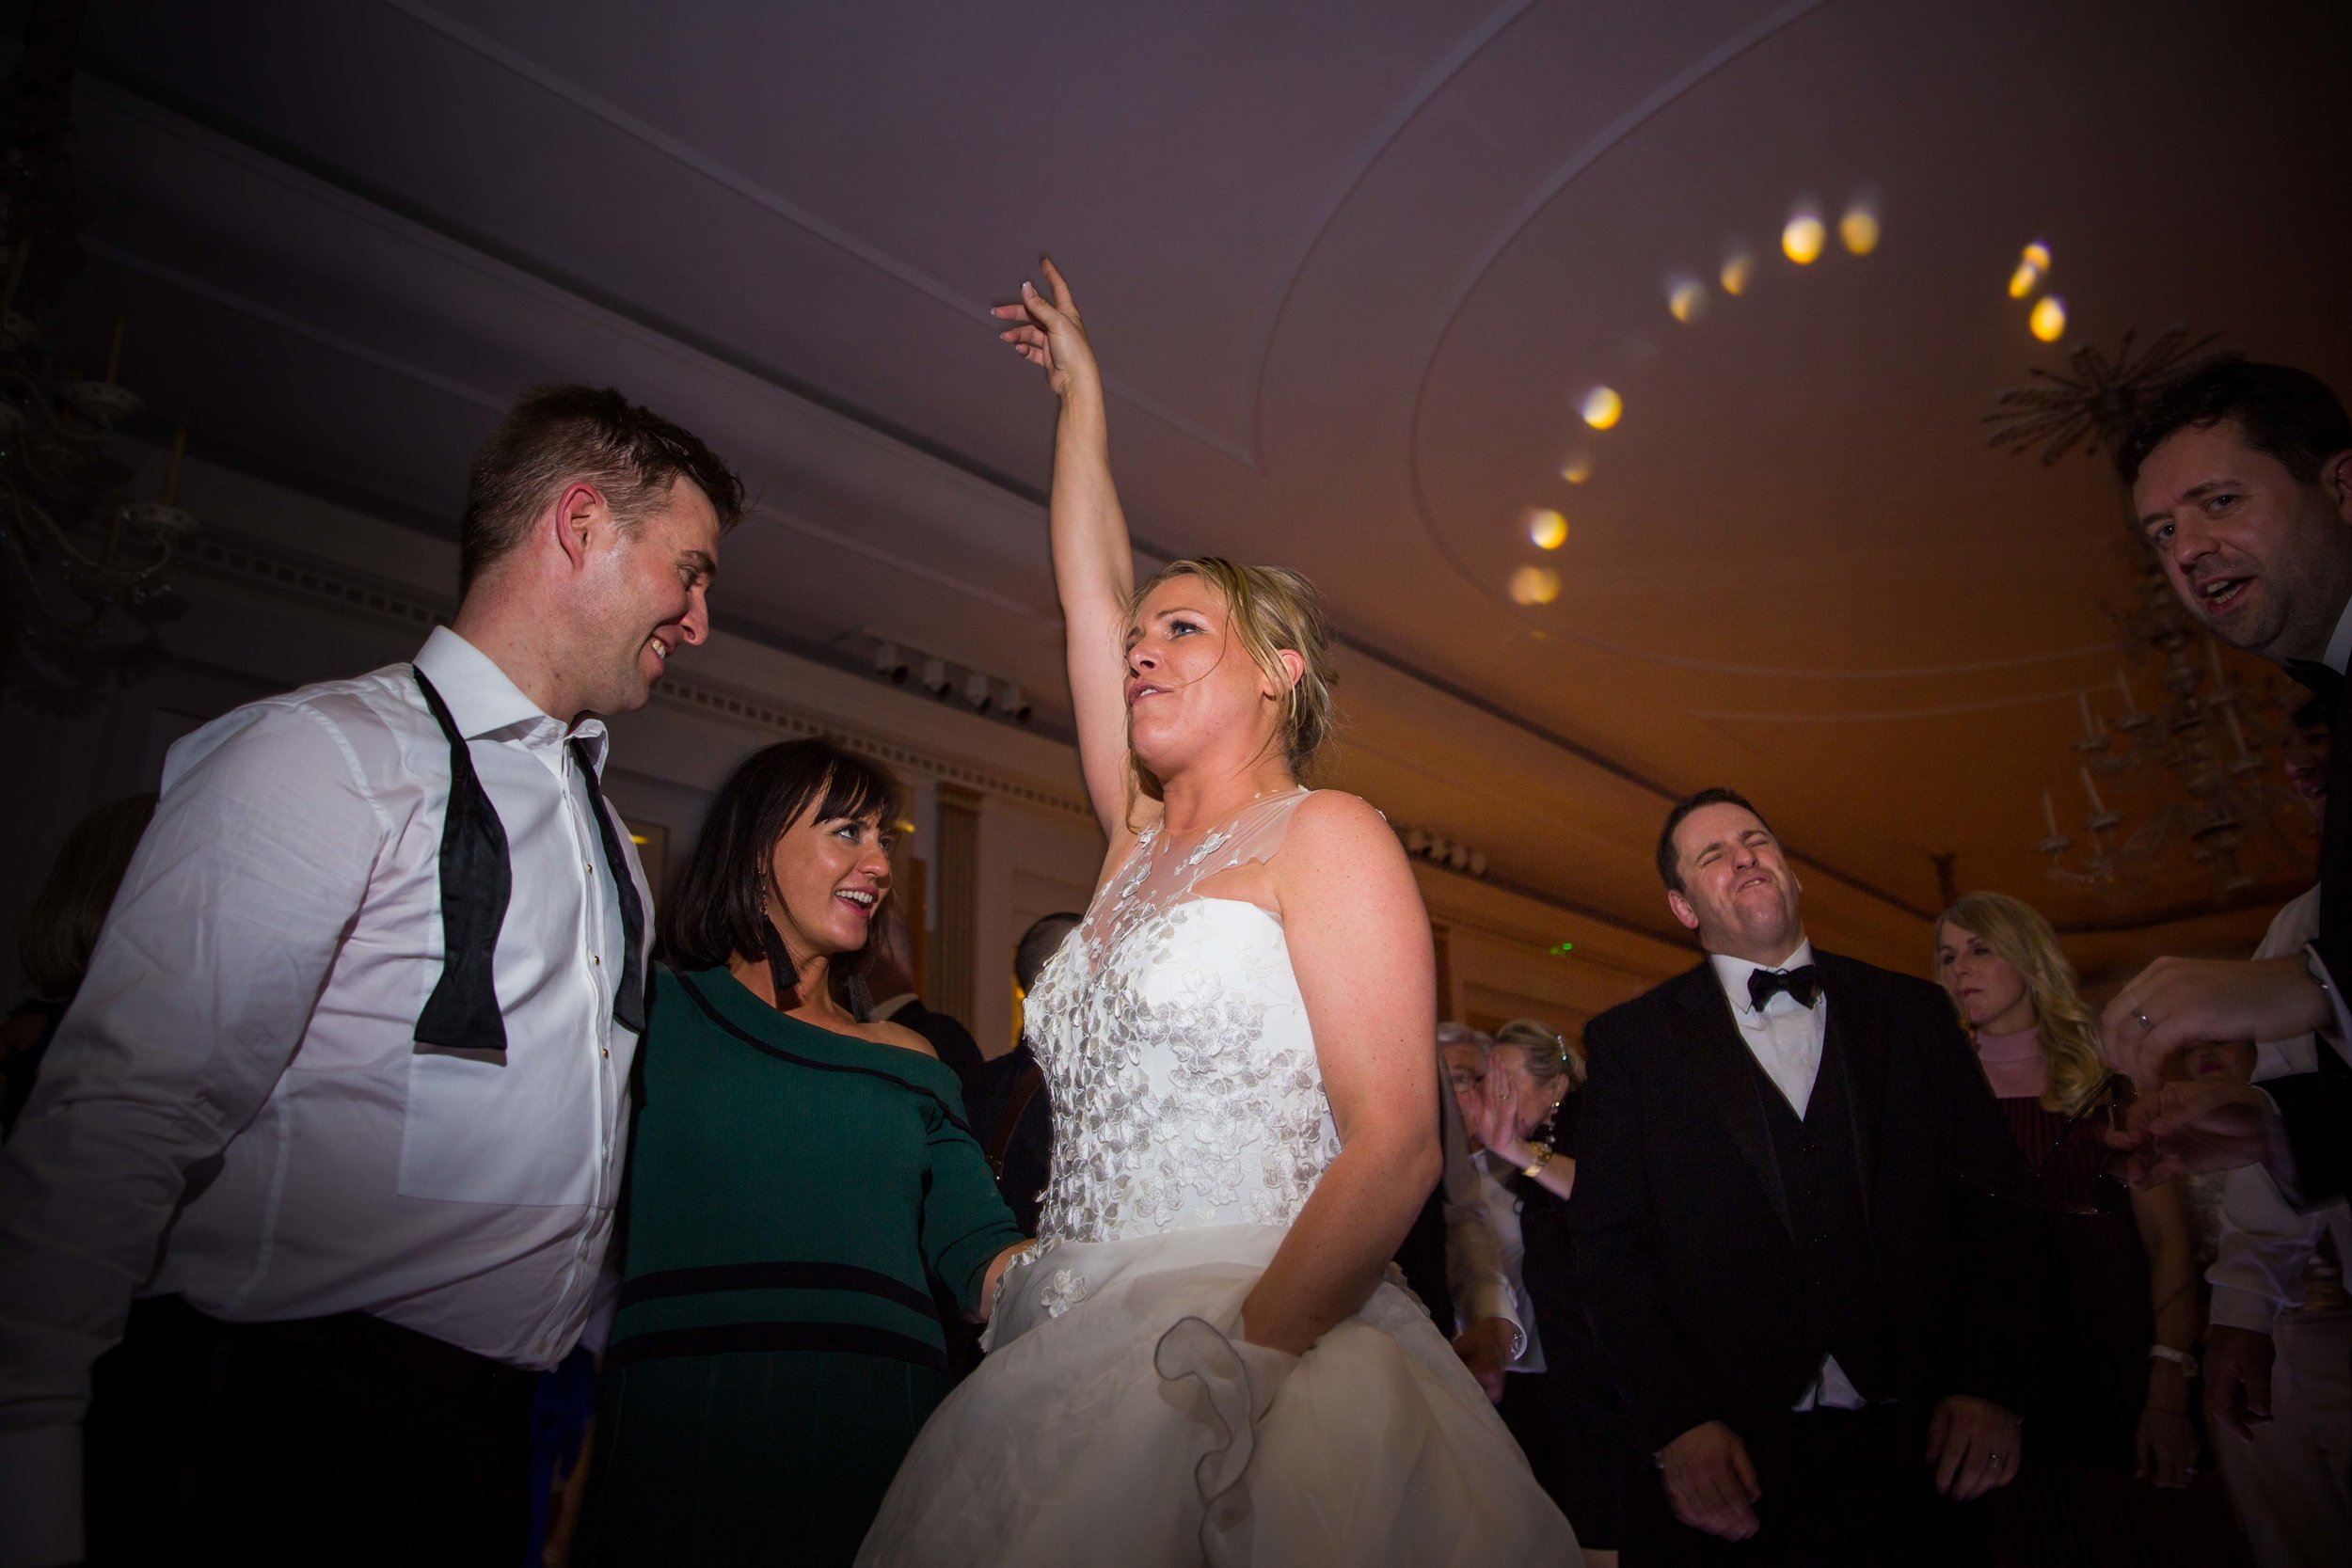 claridges-hotel-wedding-photographer-london-mayfair-natalia-smith-photography-162.jpg